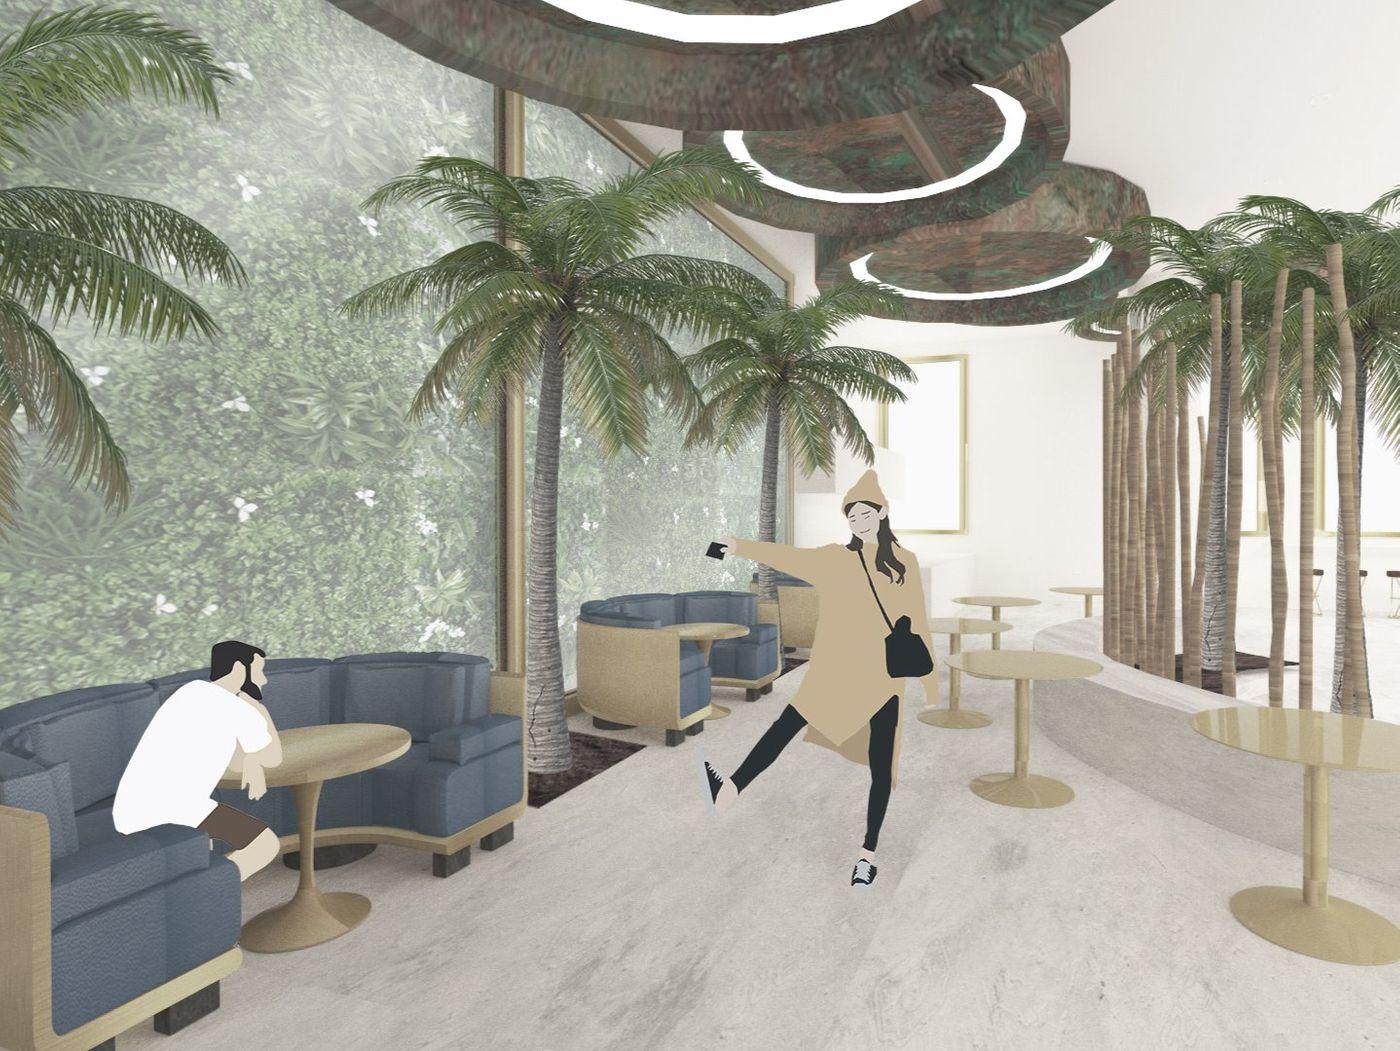 Hotel Design - Stella McCartney